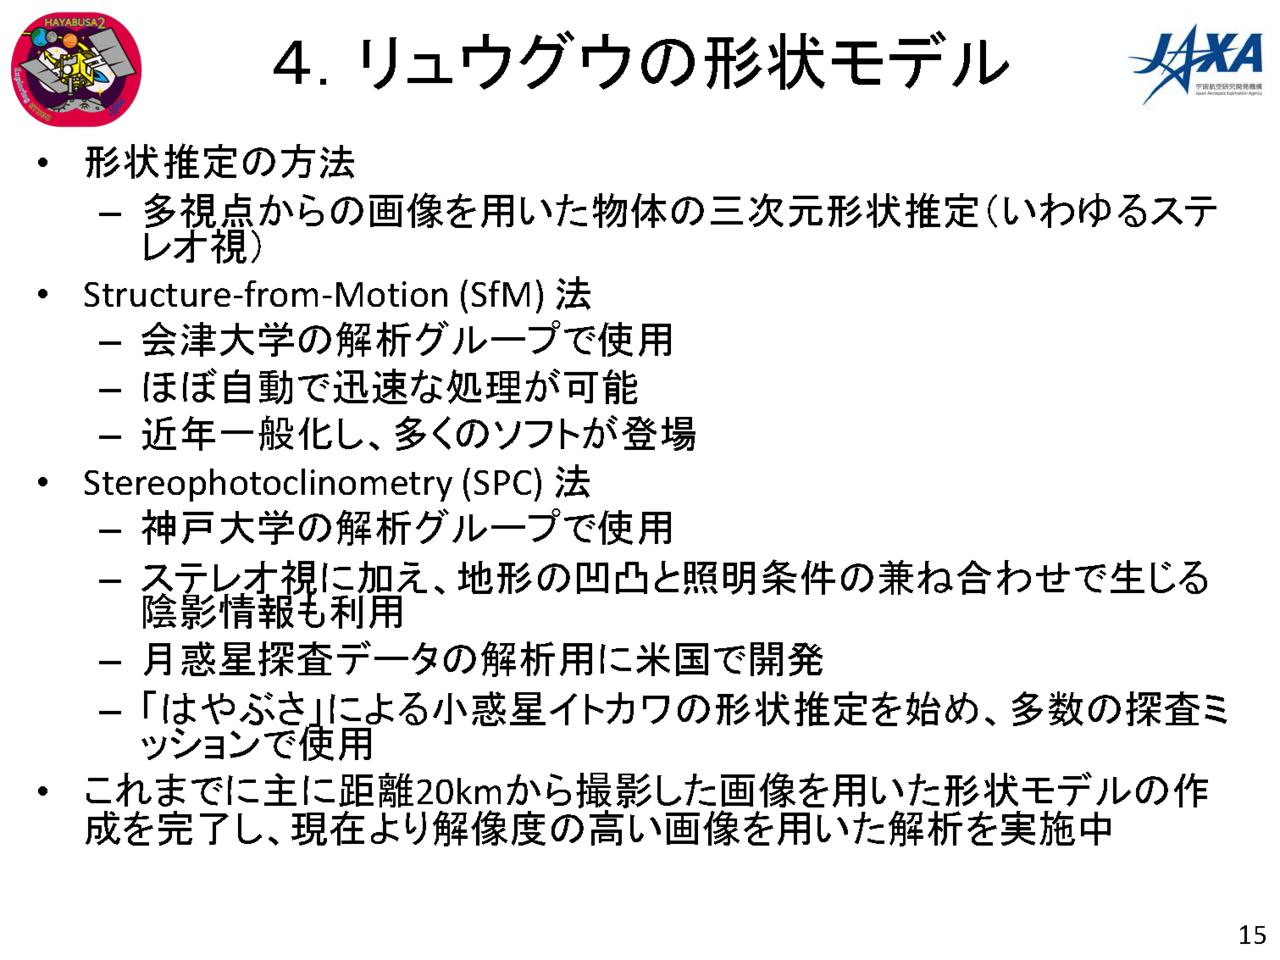 f:id:Imamura:20180802145935p:plain